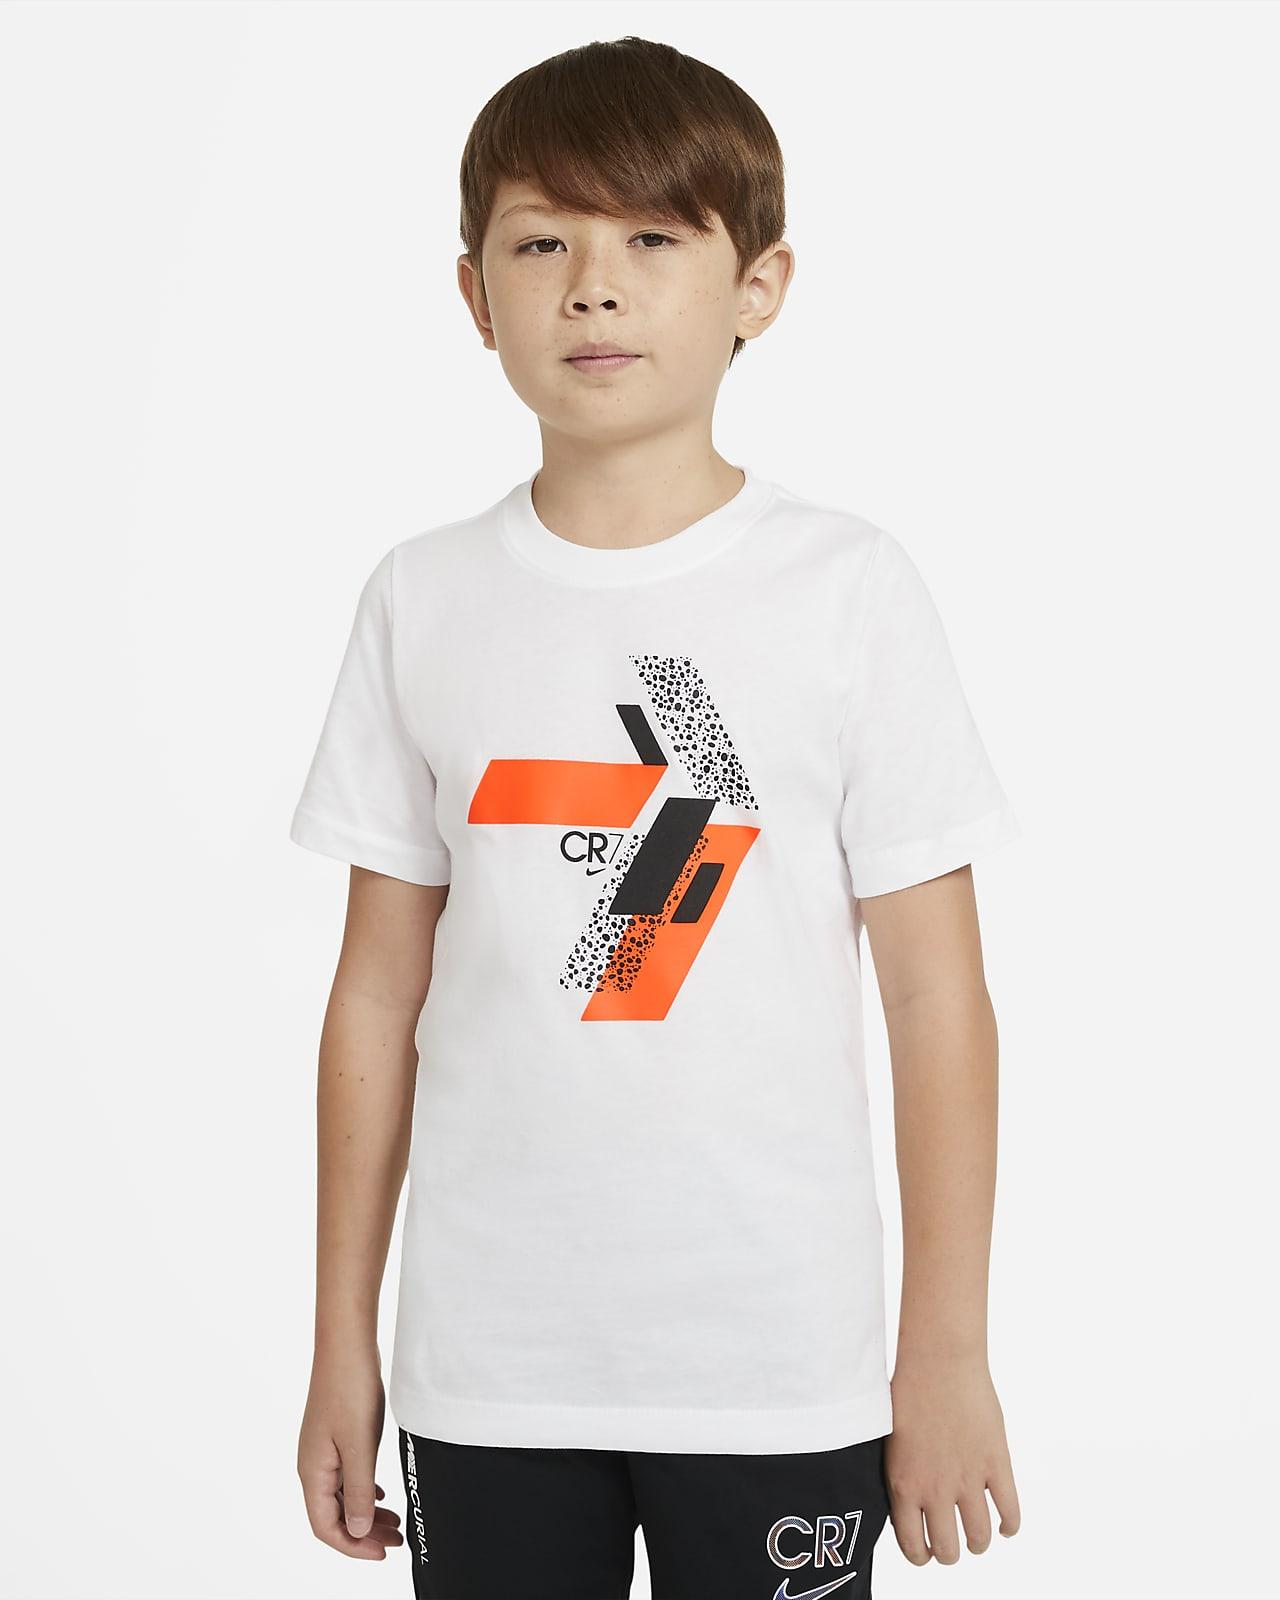 CR7 Big Kids' Soccer T-Shirt